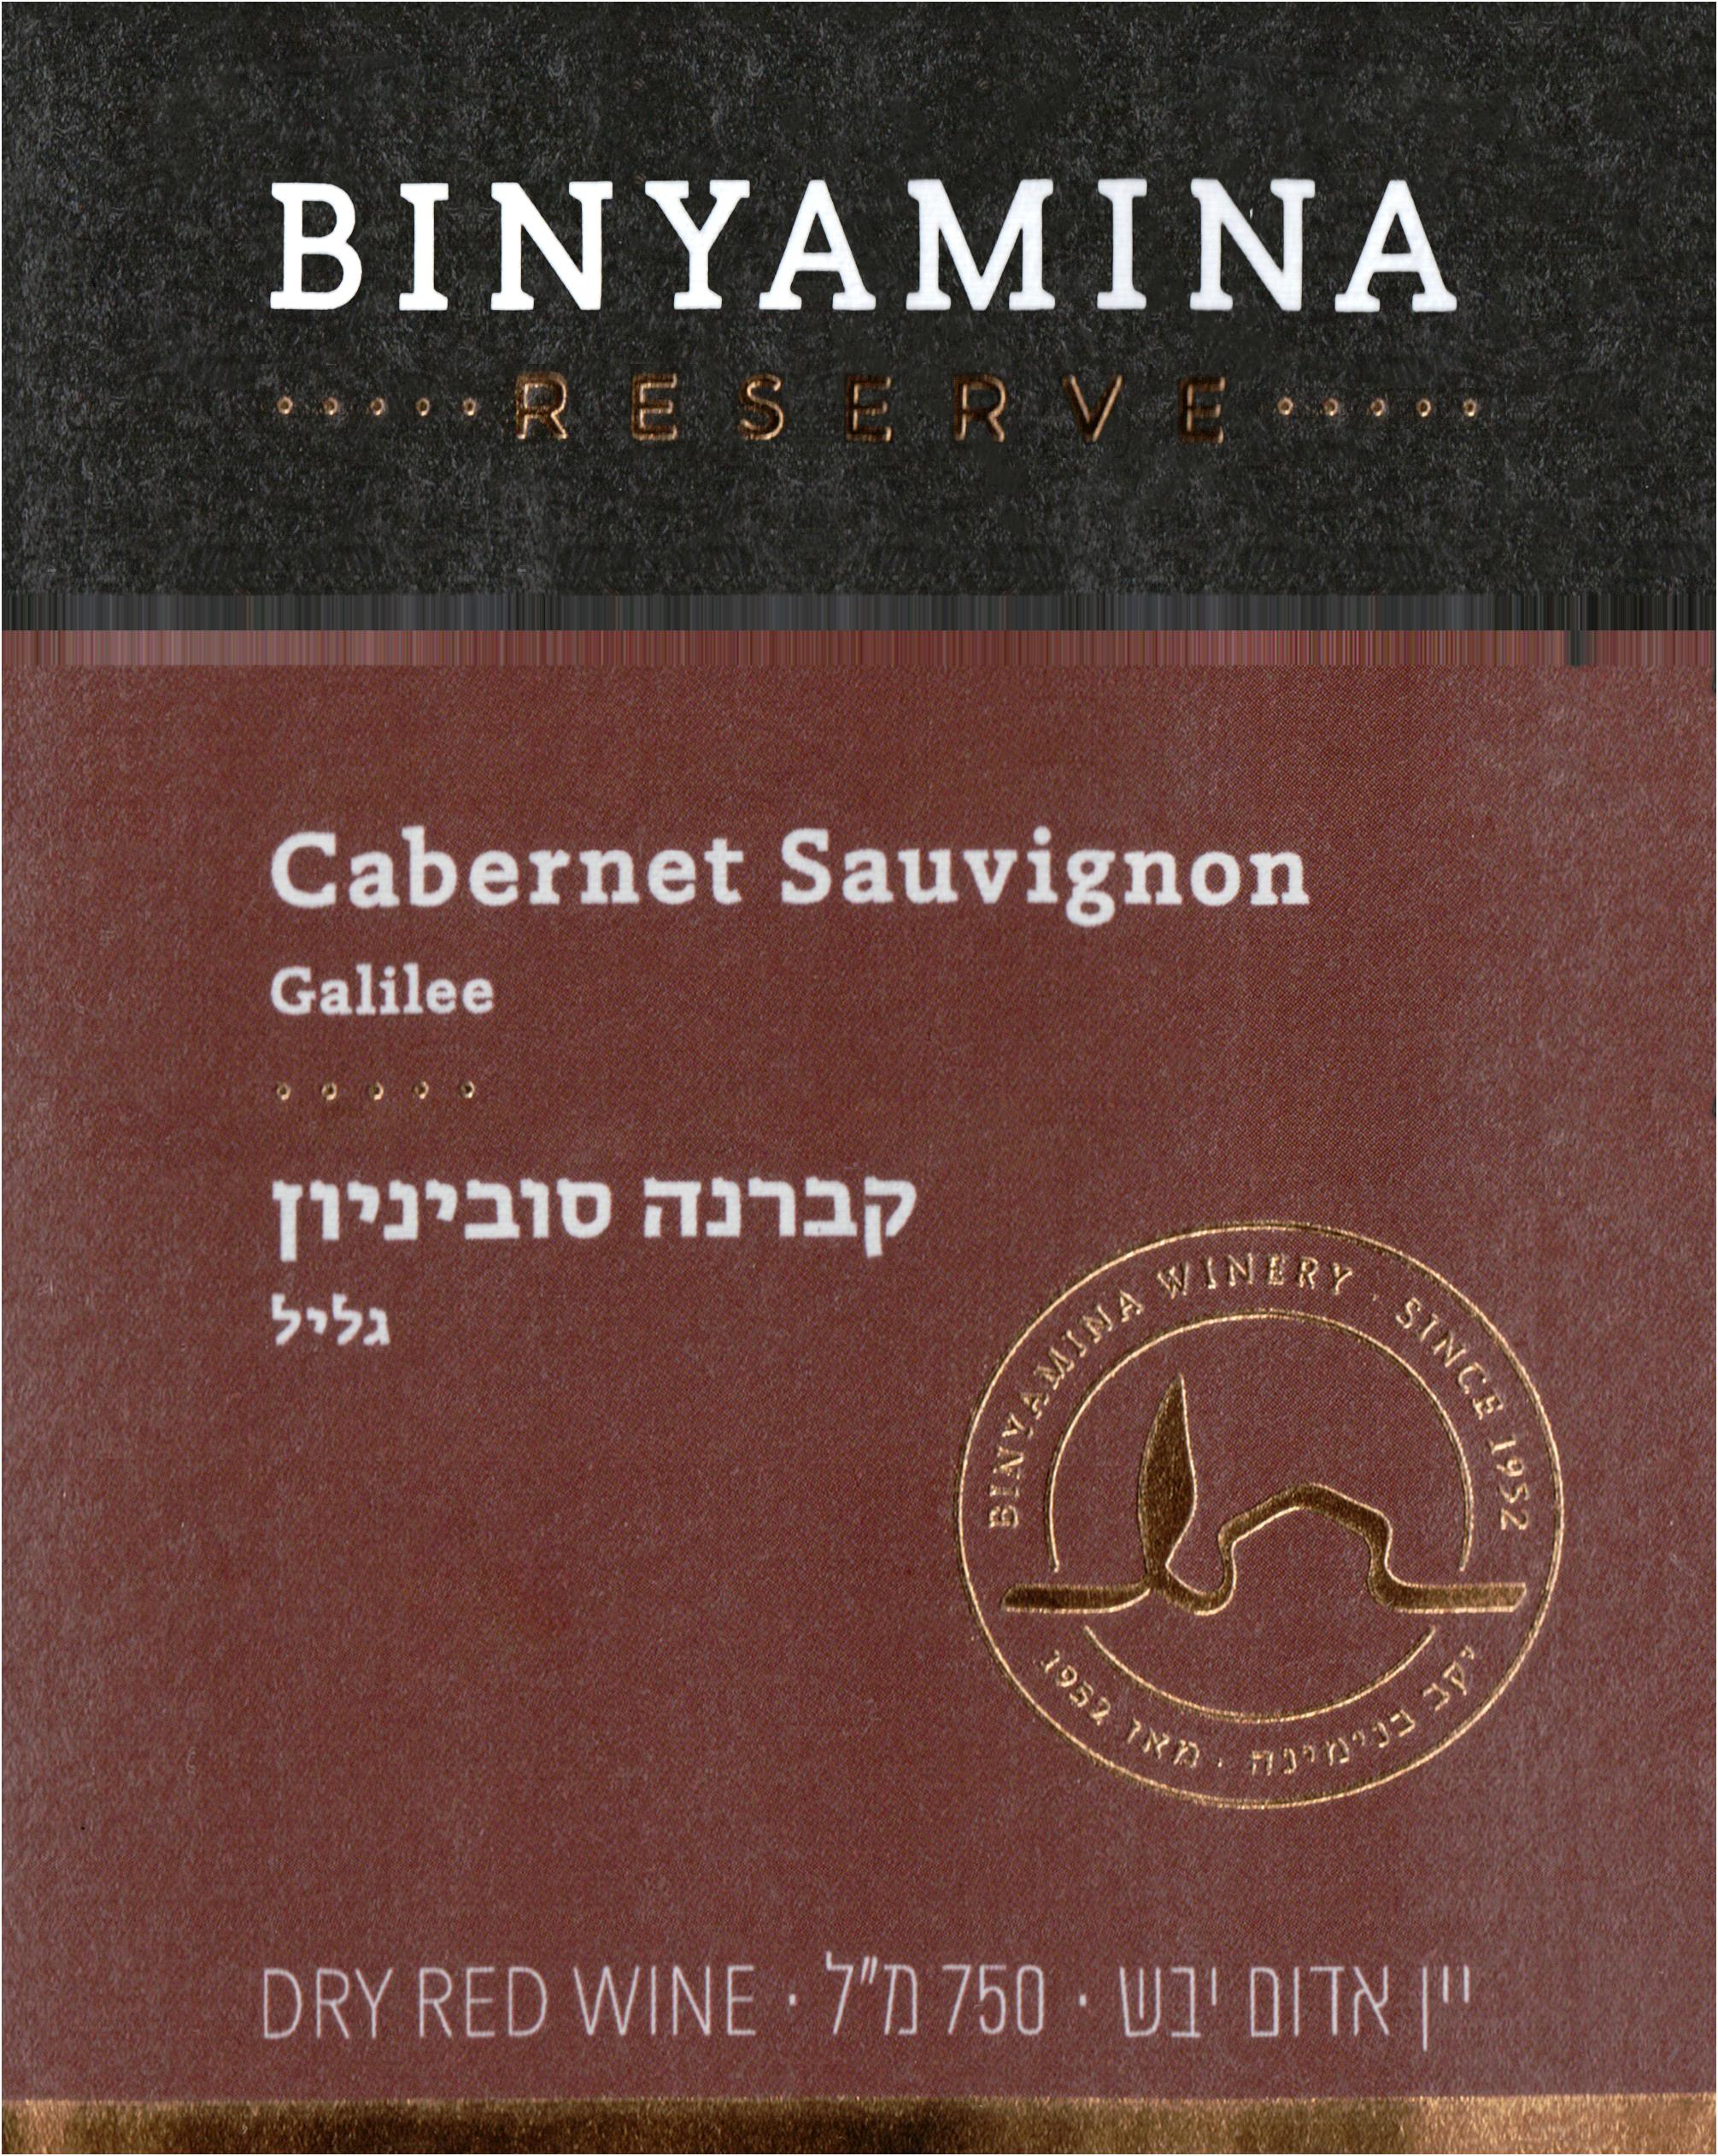 Binyamina Reserve Cabernet Sauvignon Galilee